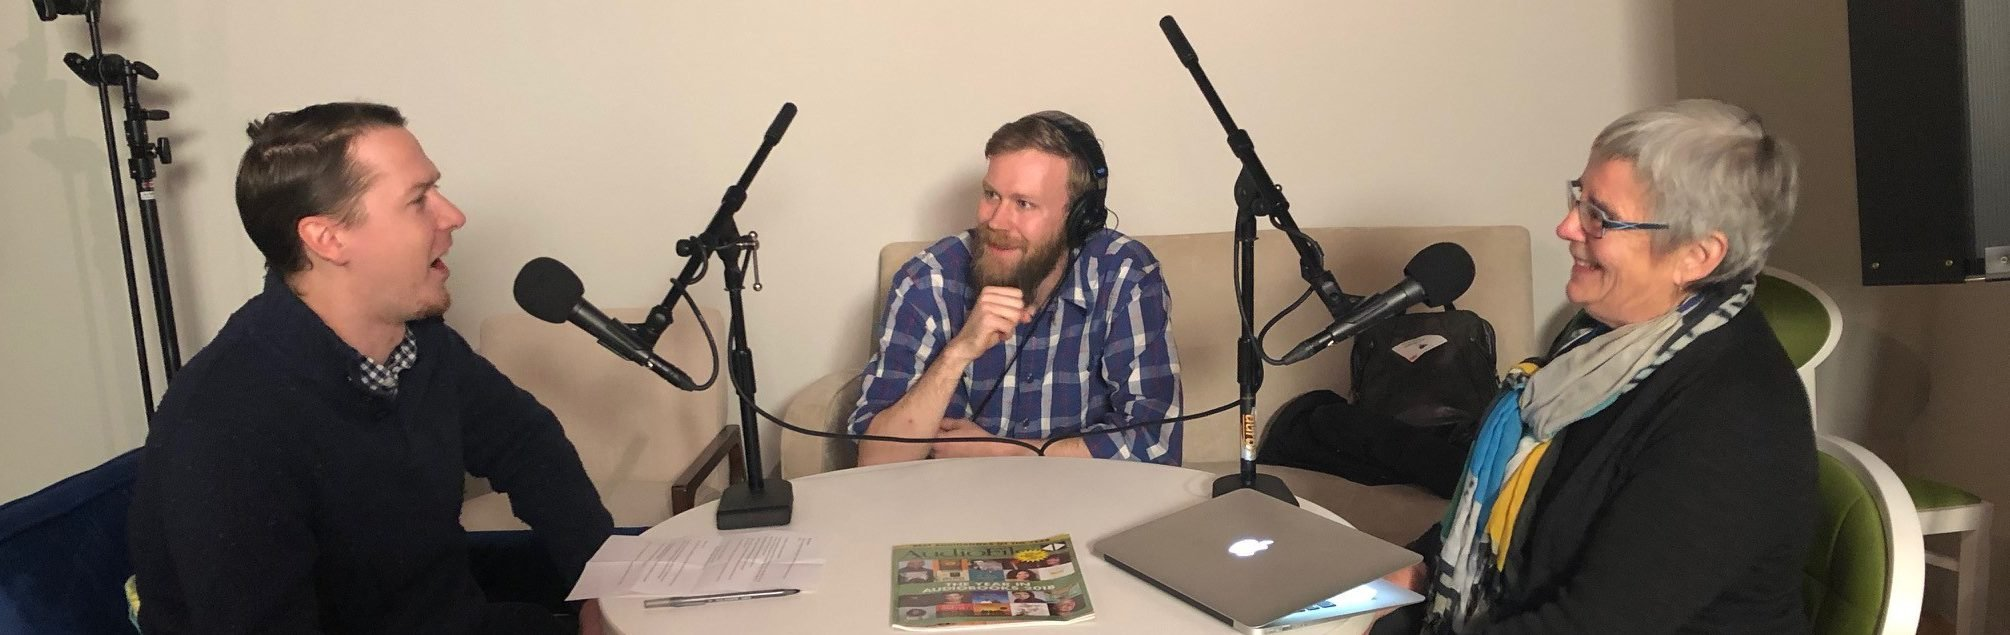 HarperPresents Recording